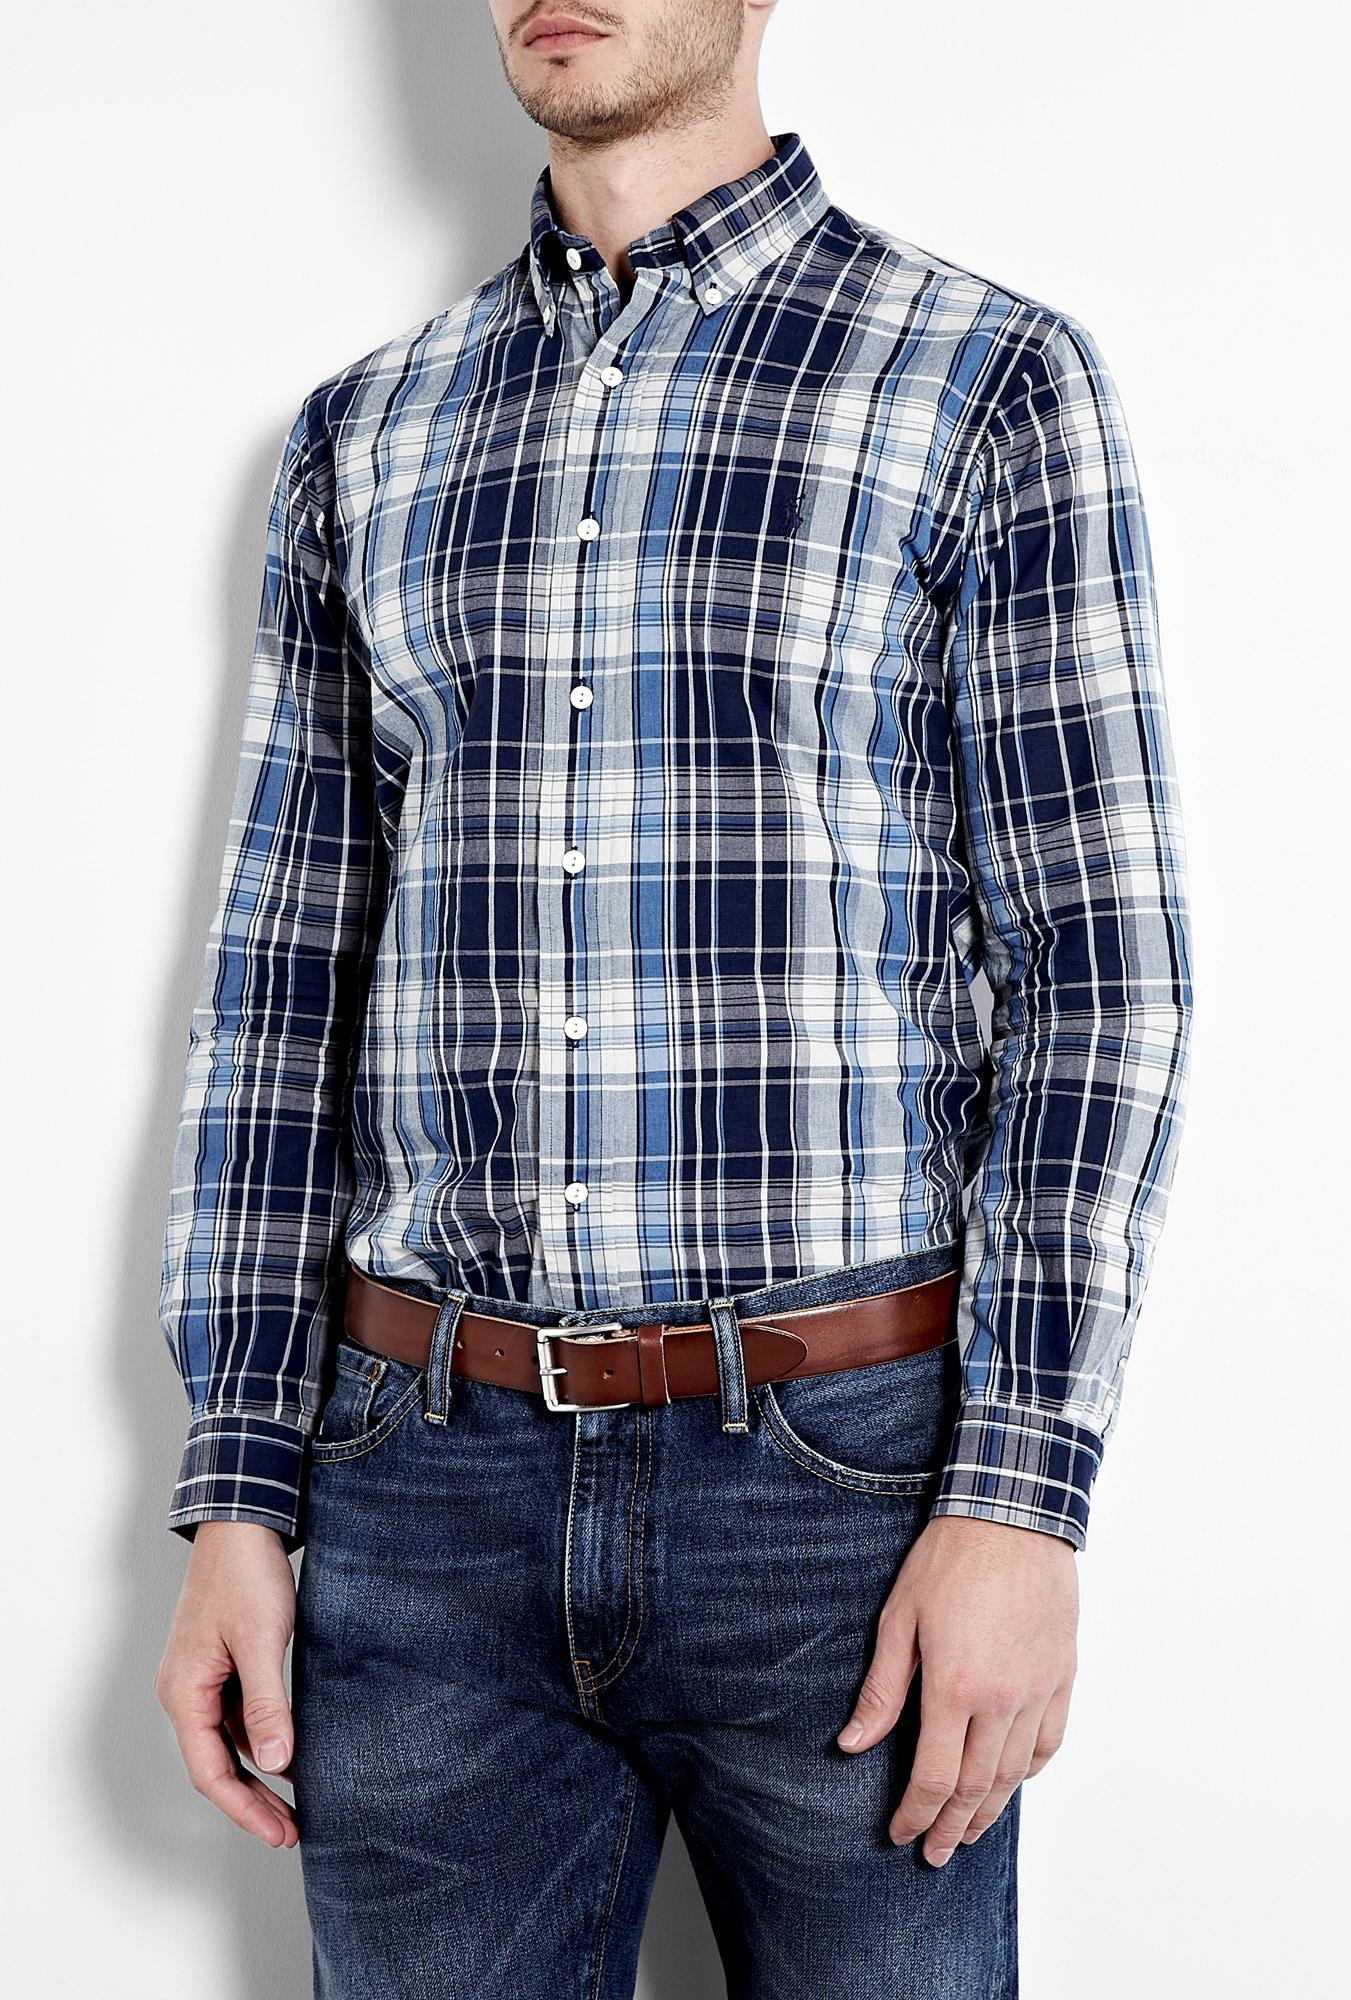 Polo ralph lauren navy blue plaid madras cotton shirt in for Navy blue plaid shirt